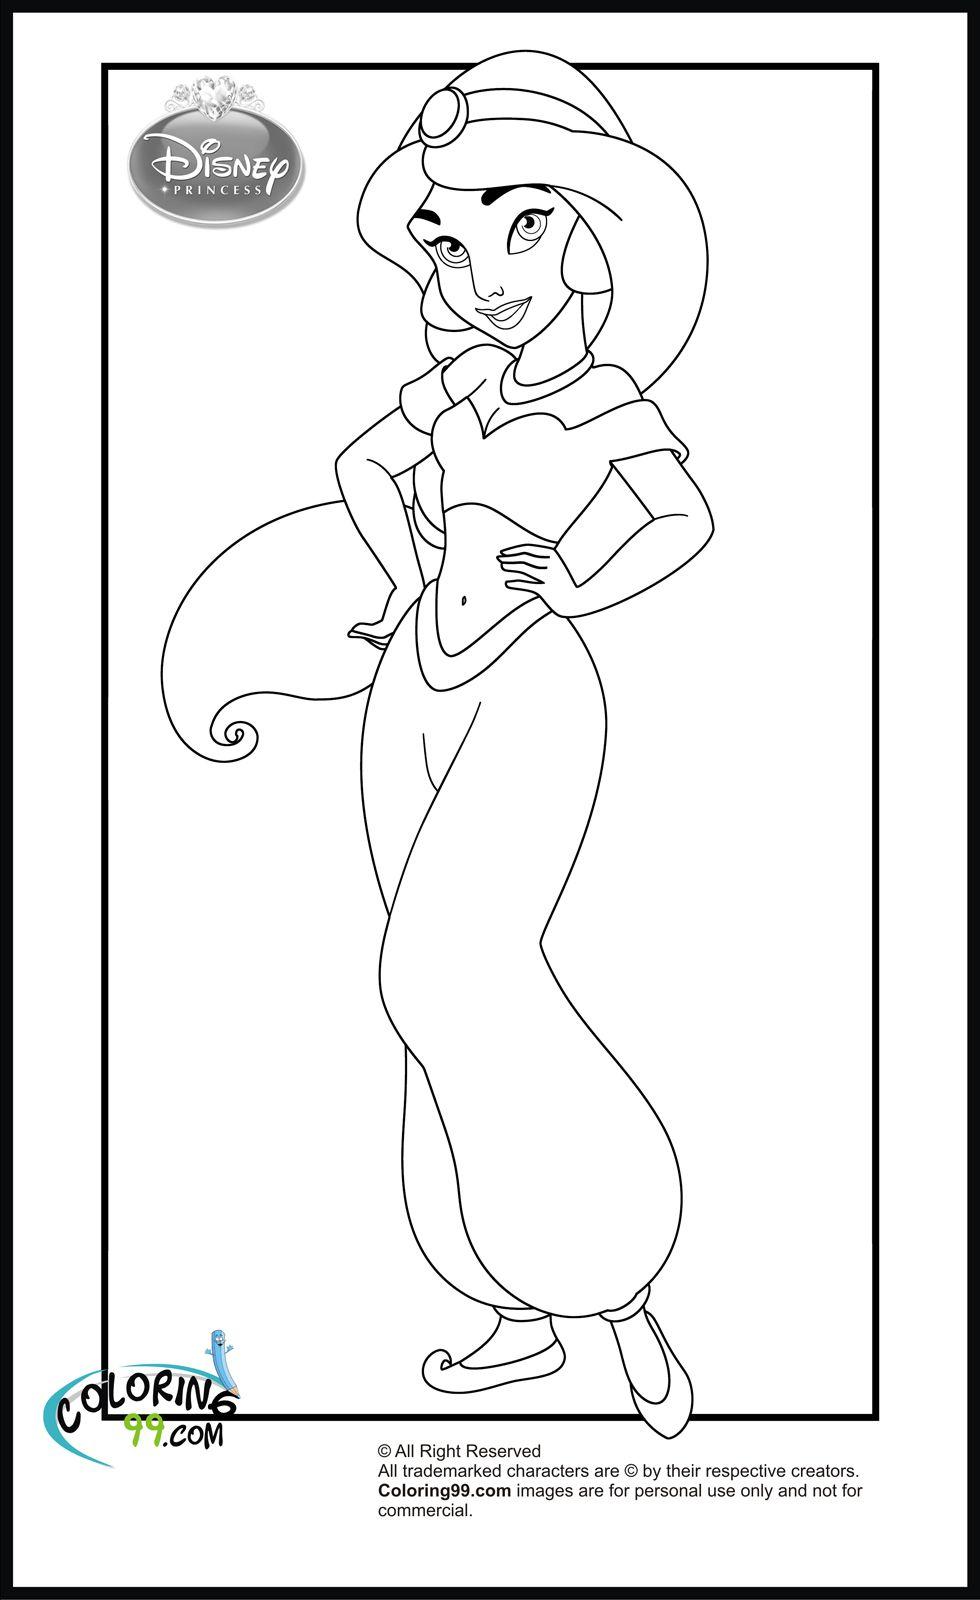 disney princess jasmine coloring pages | Prints | Pinterest | Disney ...